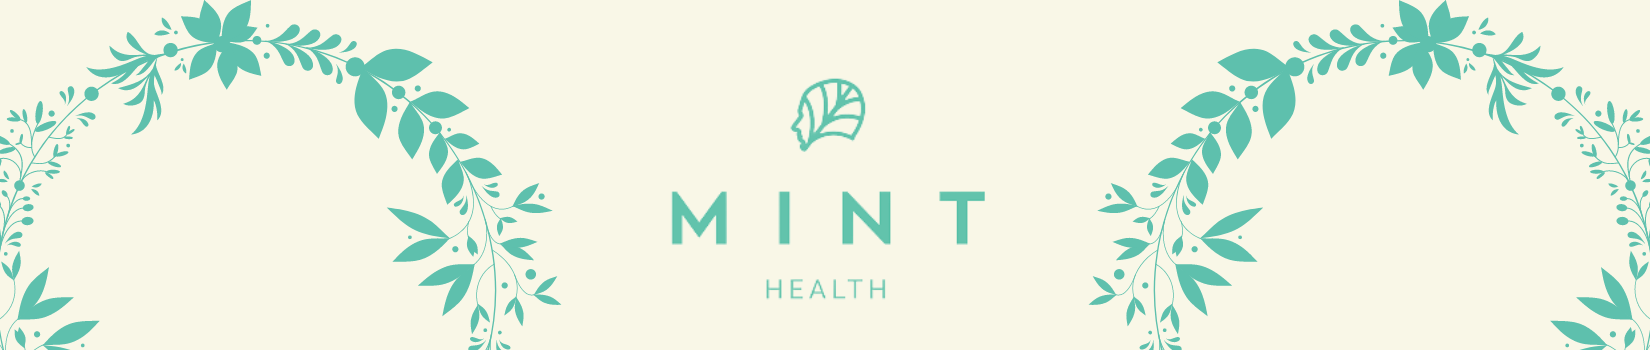 MINT Health